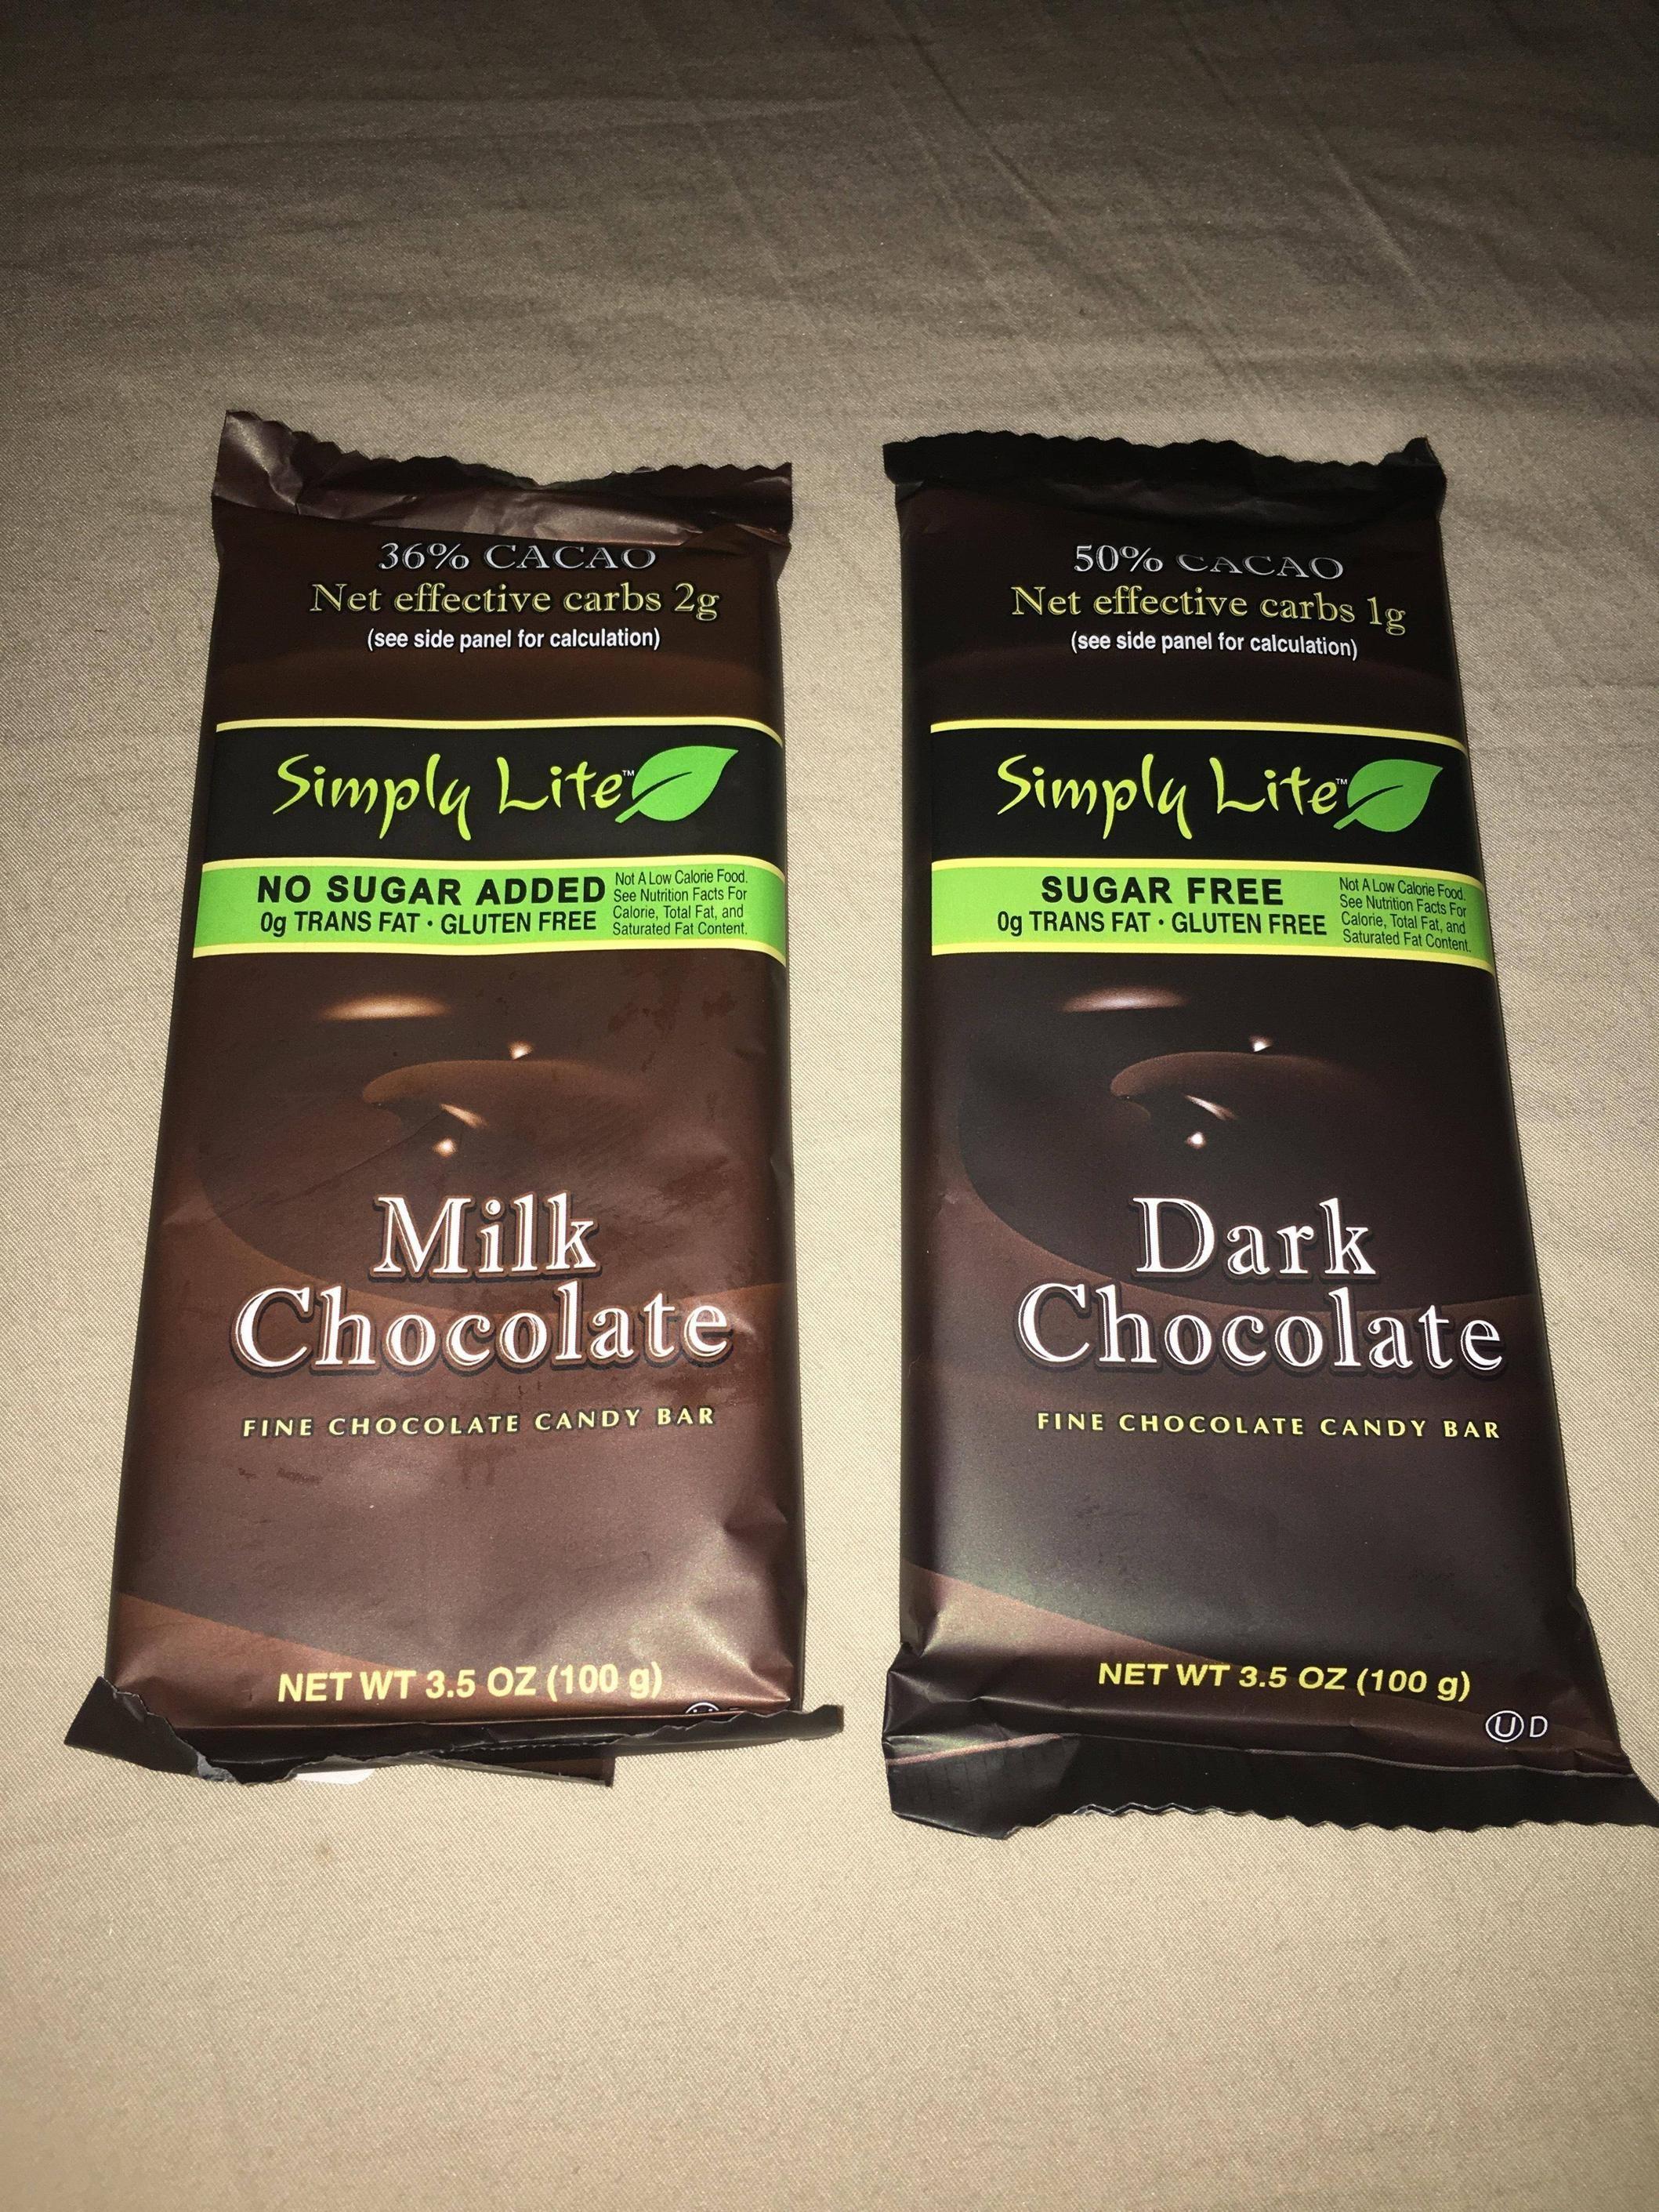 Trader Joes Keto Chocolate Bars 1 Or 2 NET Carbs Per Serving GODSEND